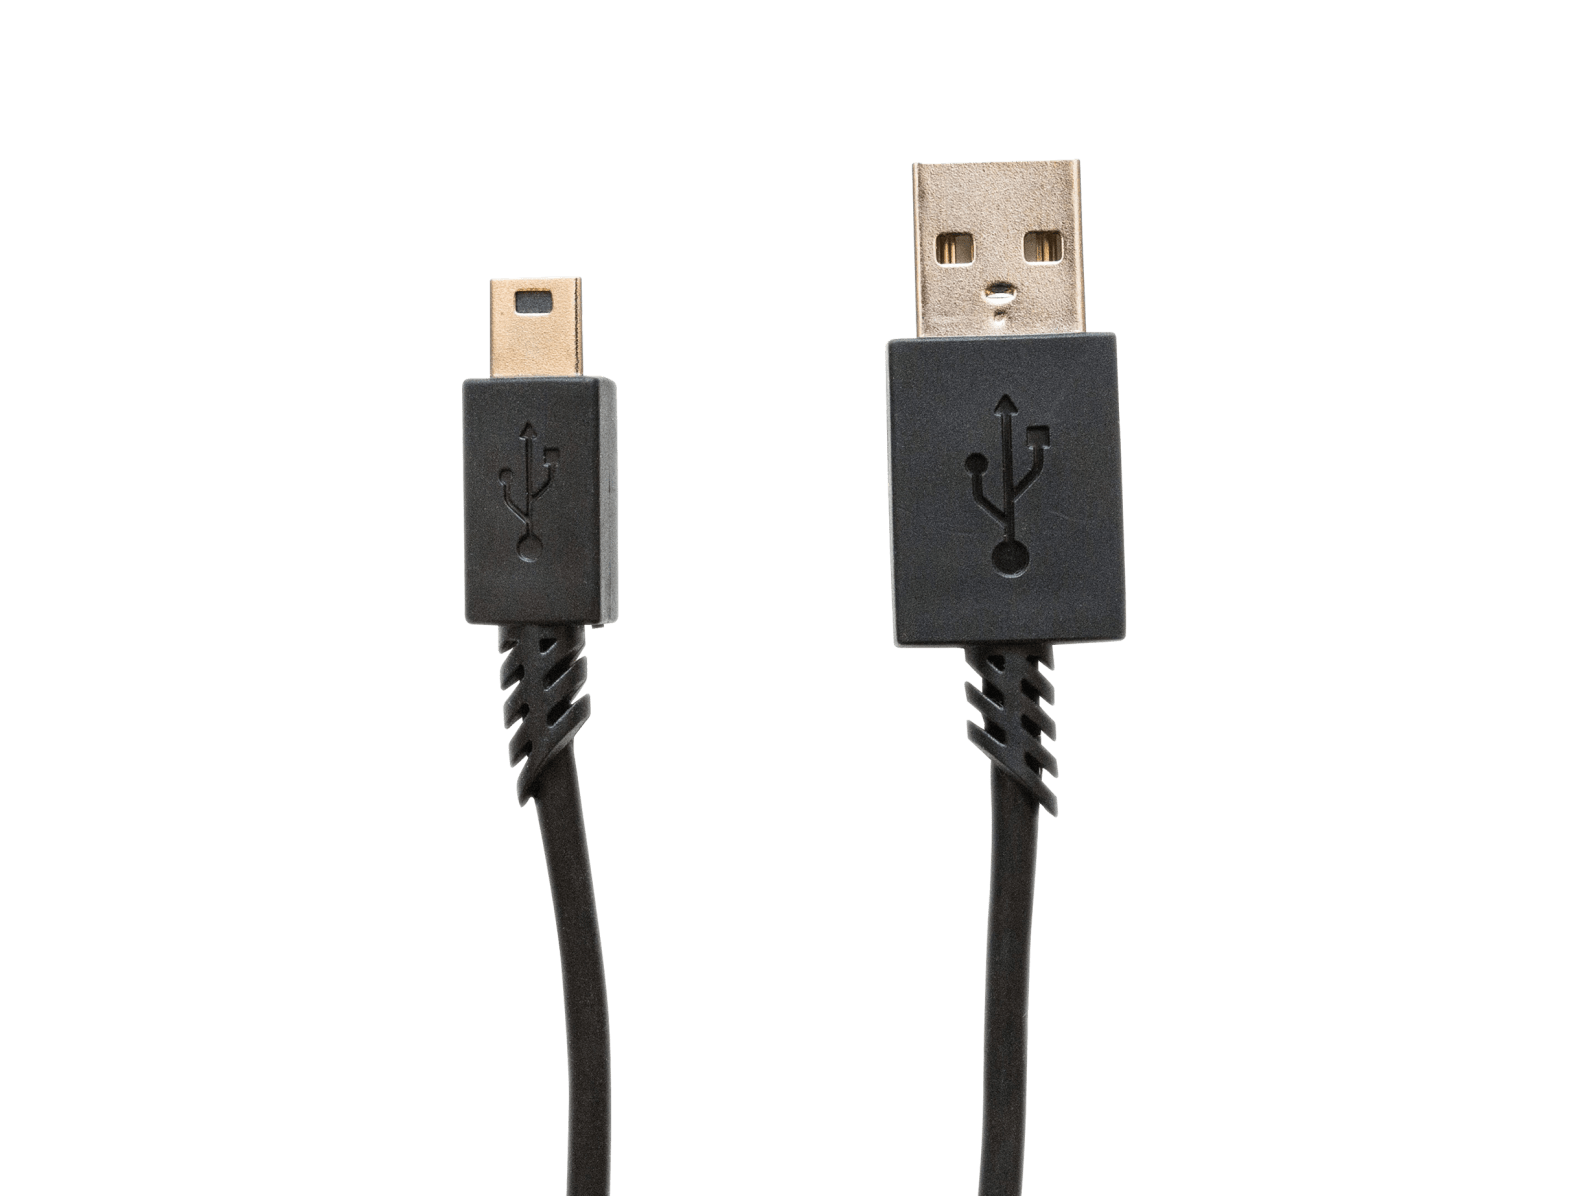 mini-usb-cable-gallery-01